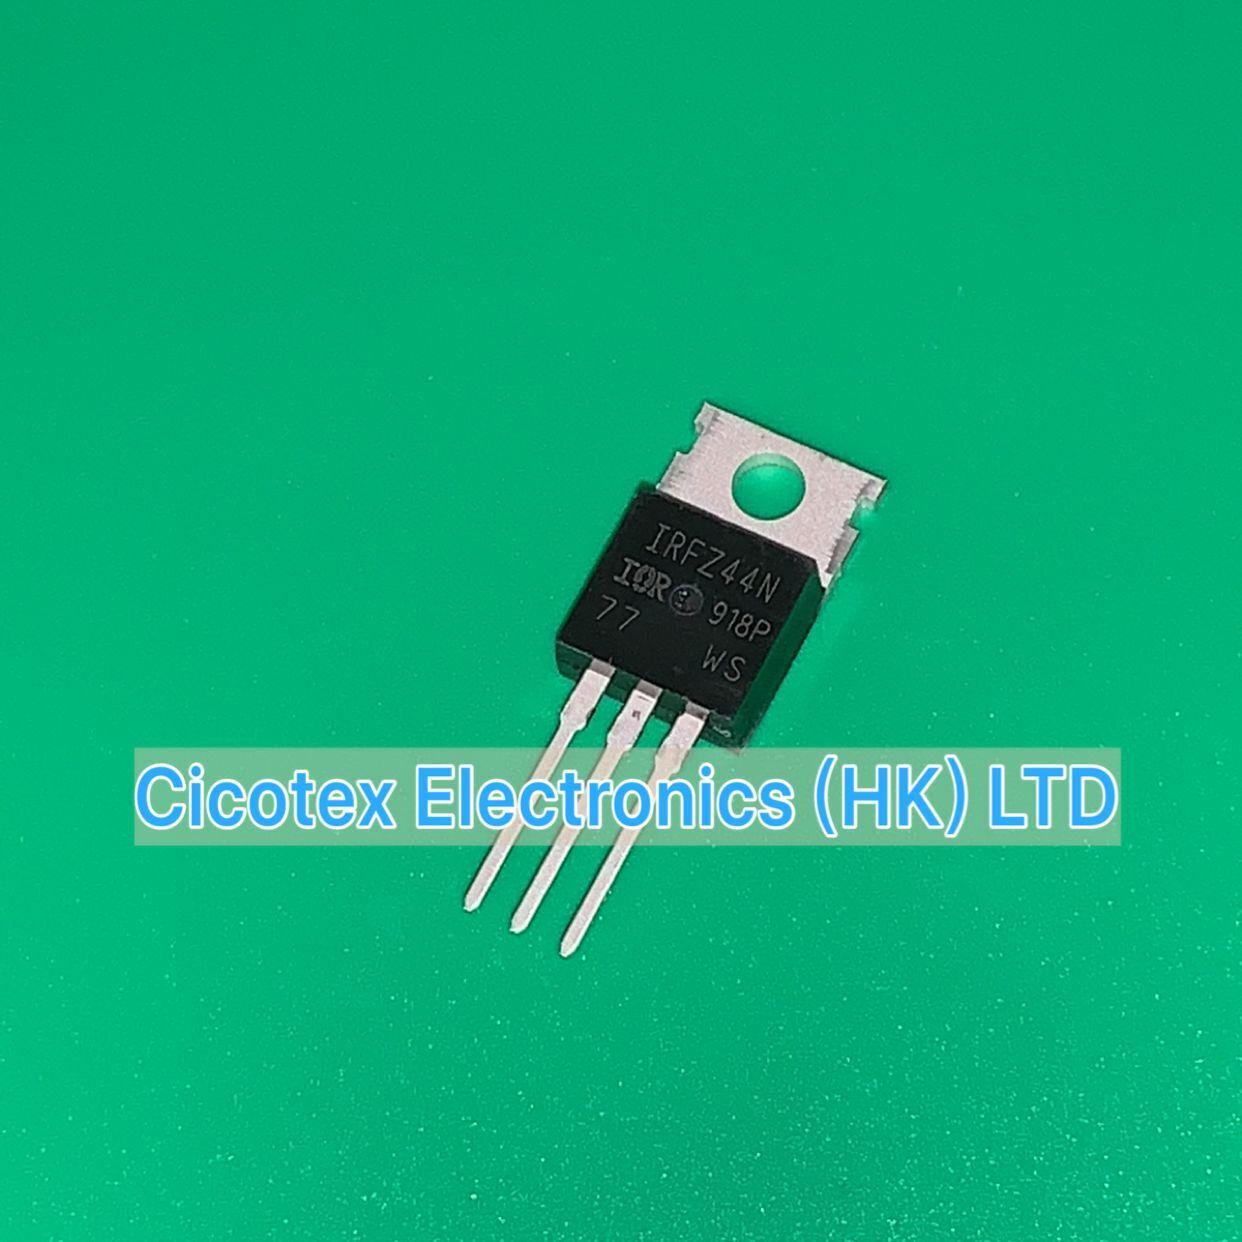 10 stks/partij IRFZ44N 55V49A veld effect transistor TO220 NPN IRFZ44 IRFZ44NPBF TO-220AB MOSFET N-CH 55 V 49A TO220AB